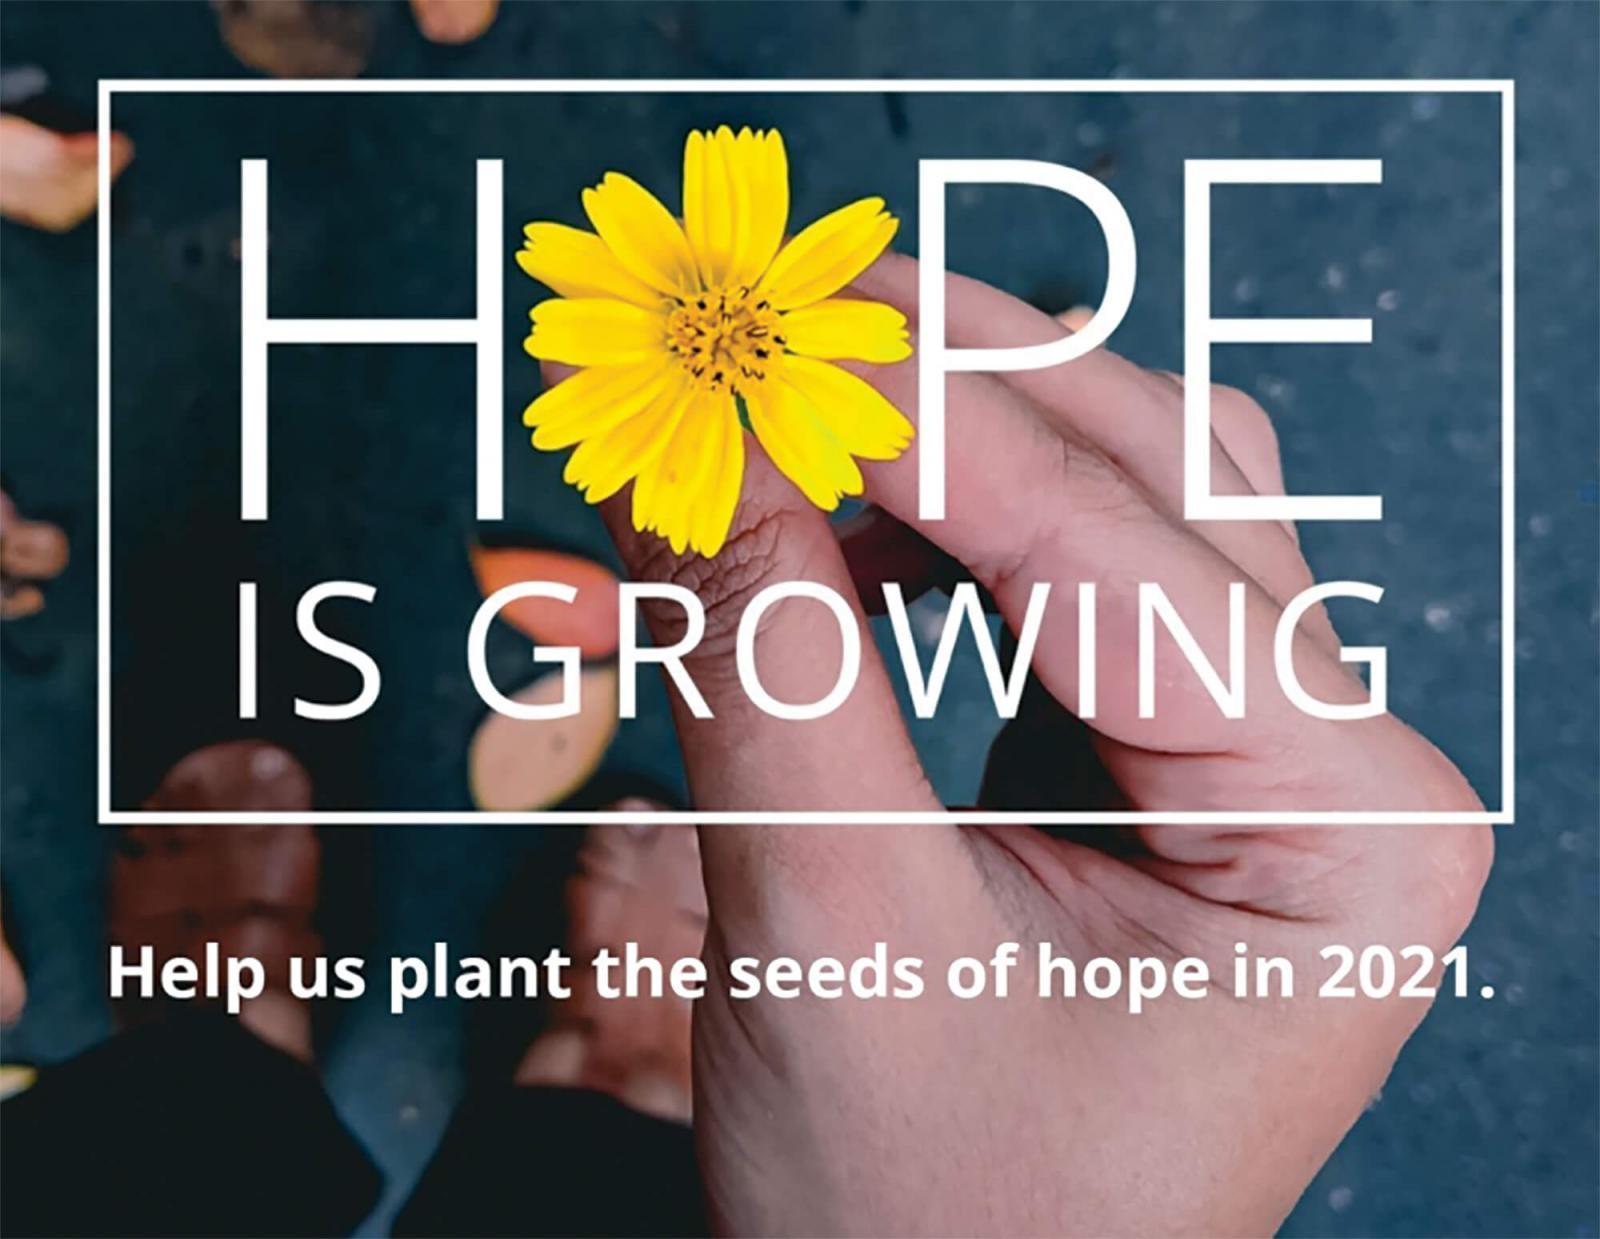 Planting hope from coast to coast